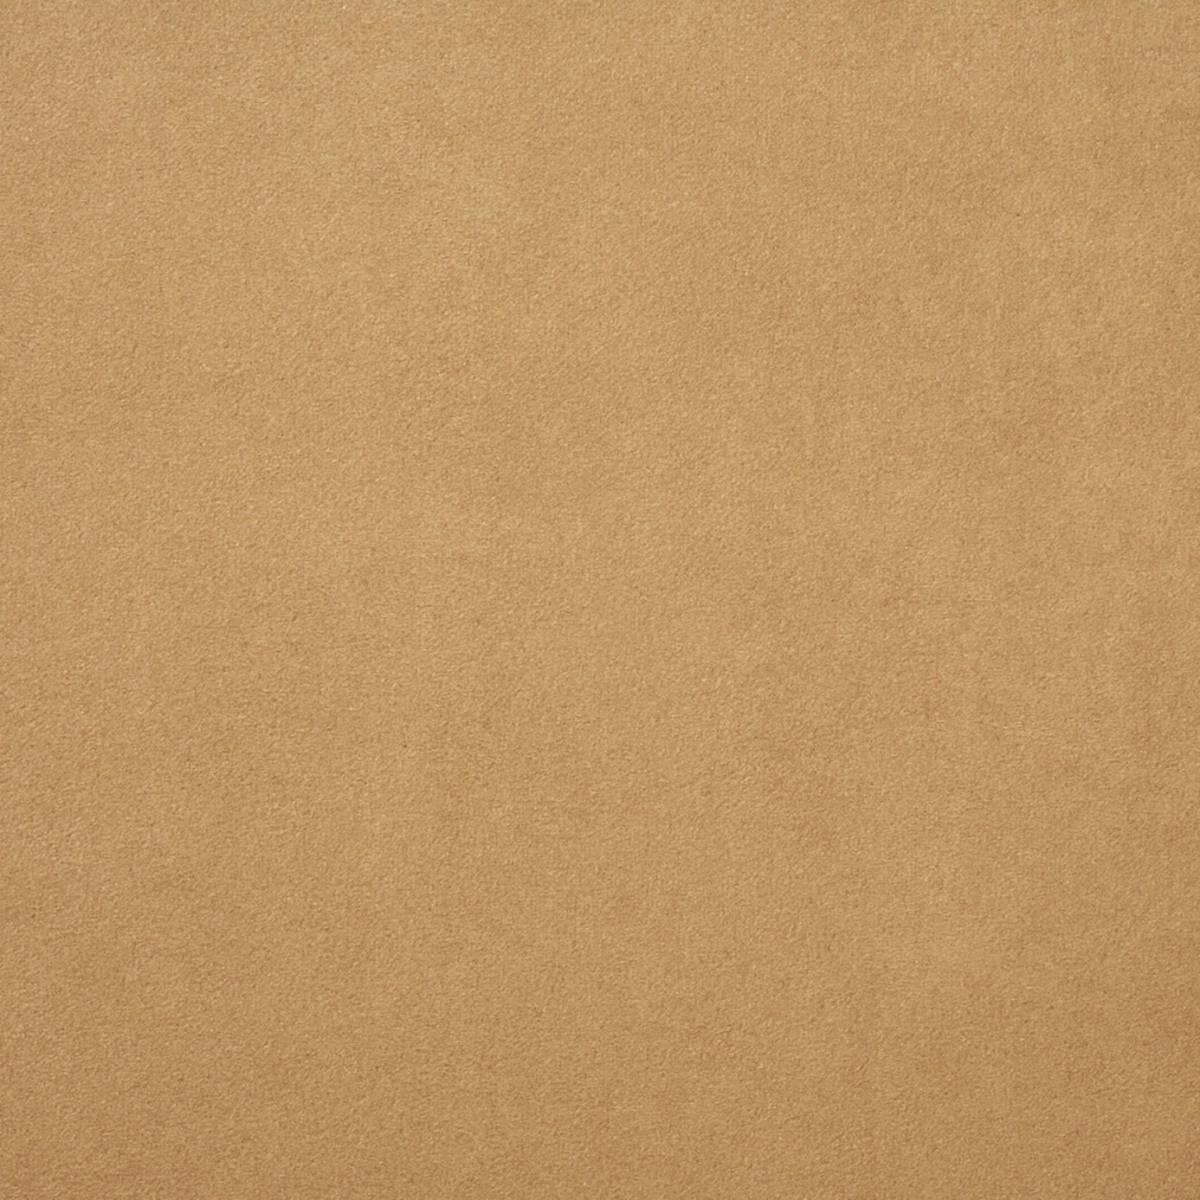 Macrosuede Fabric Tan Macrosuedetan Warwick